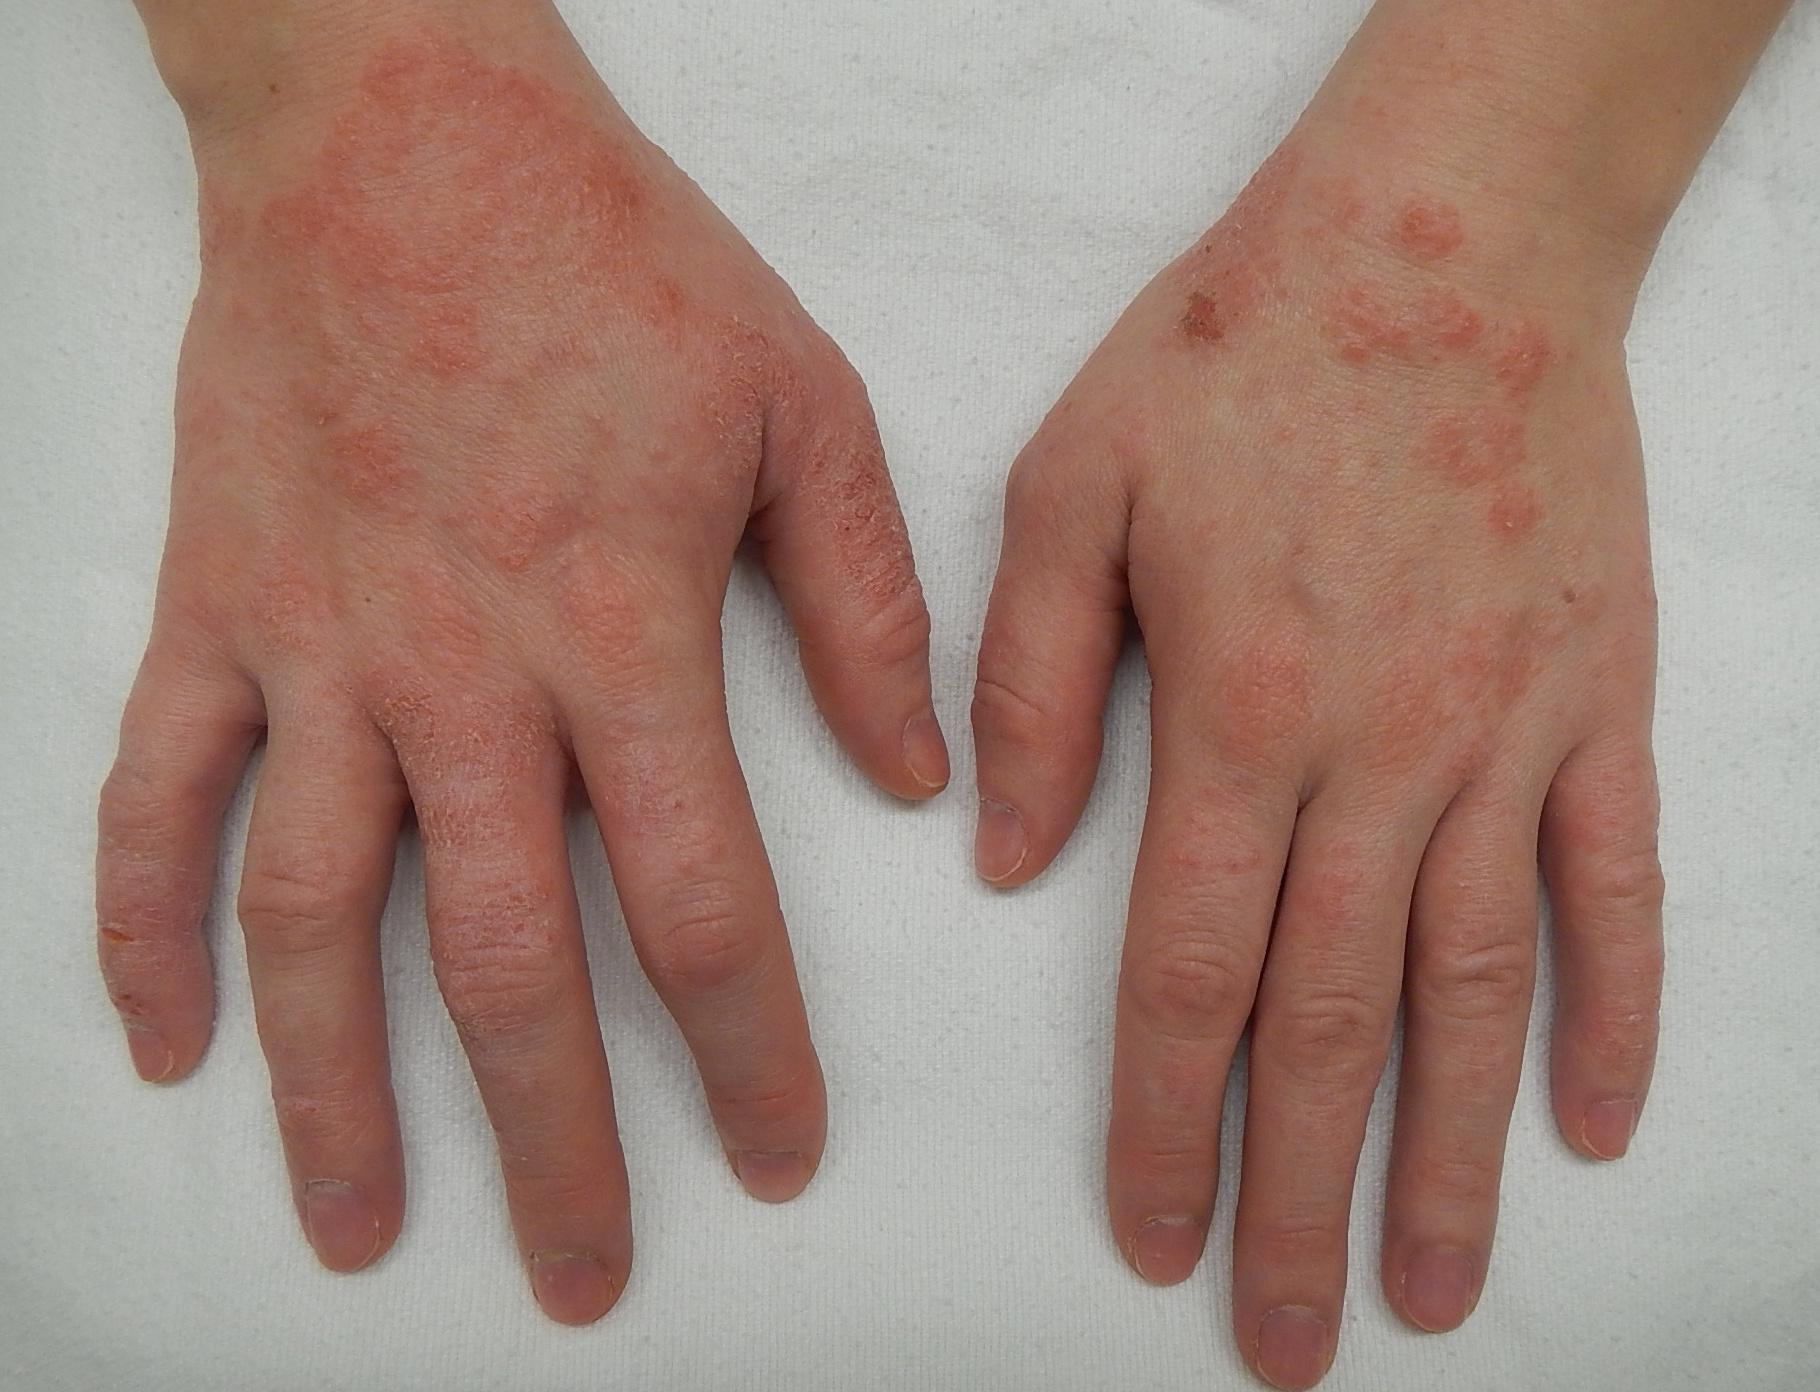 vörös foltok a kezek bőrén, mint kezelni